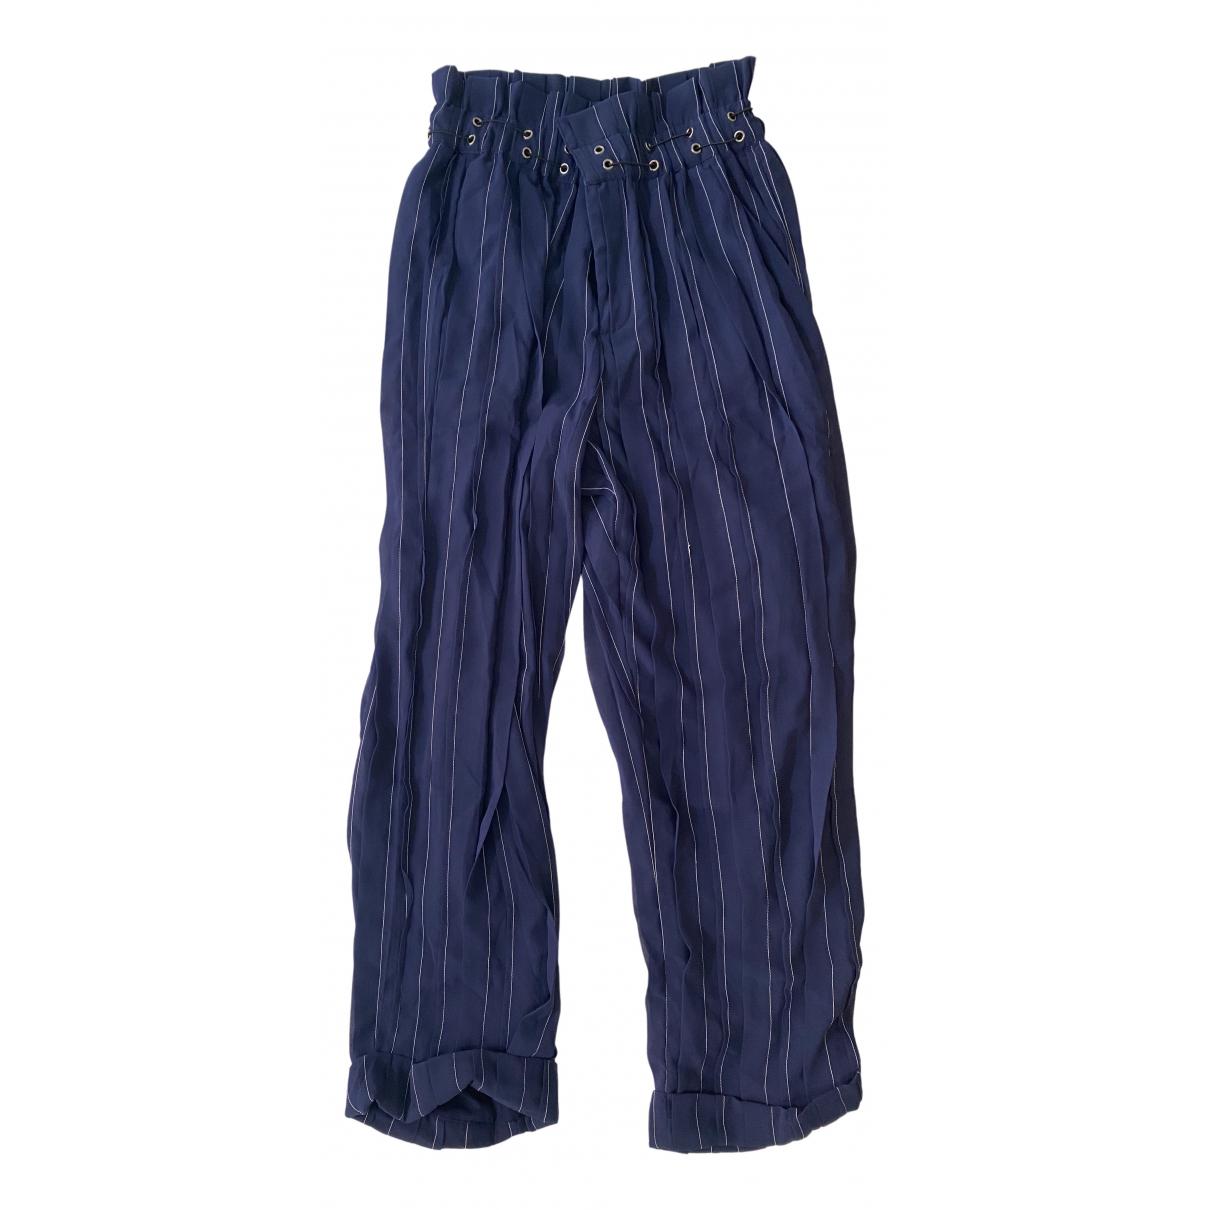 Tularosa - Pantalon   pour femme - bleu